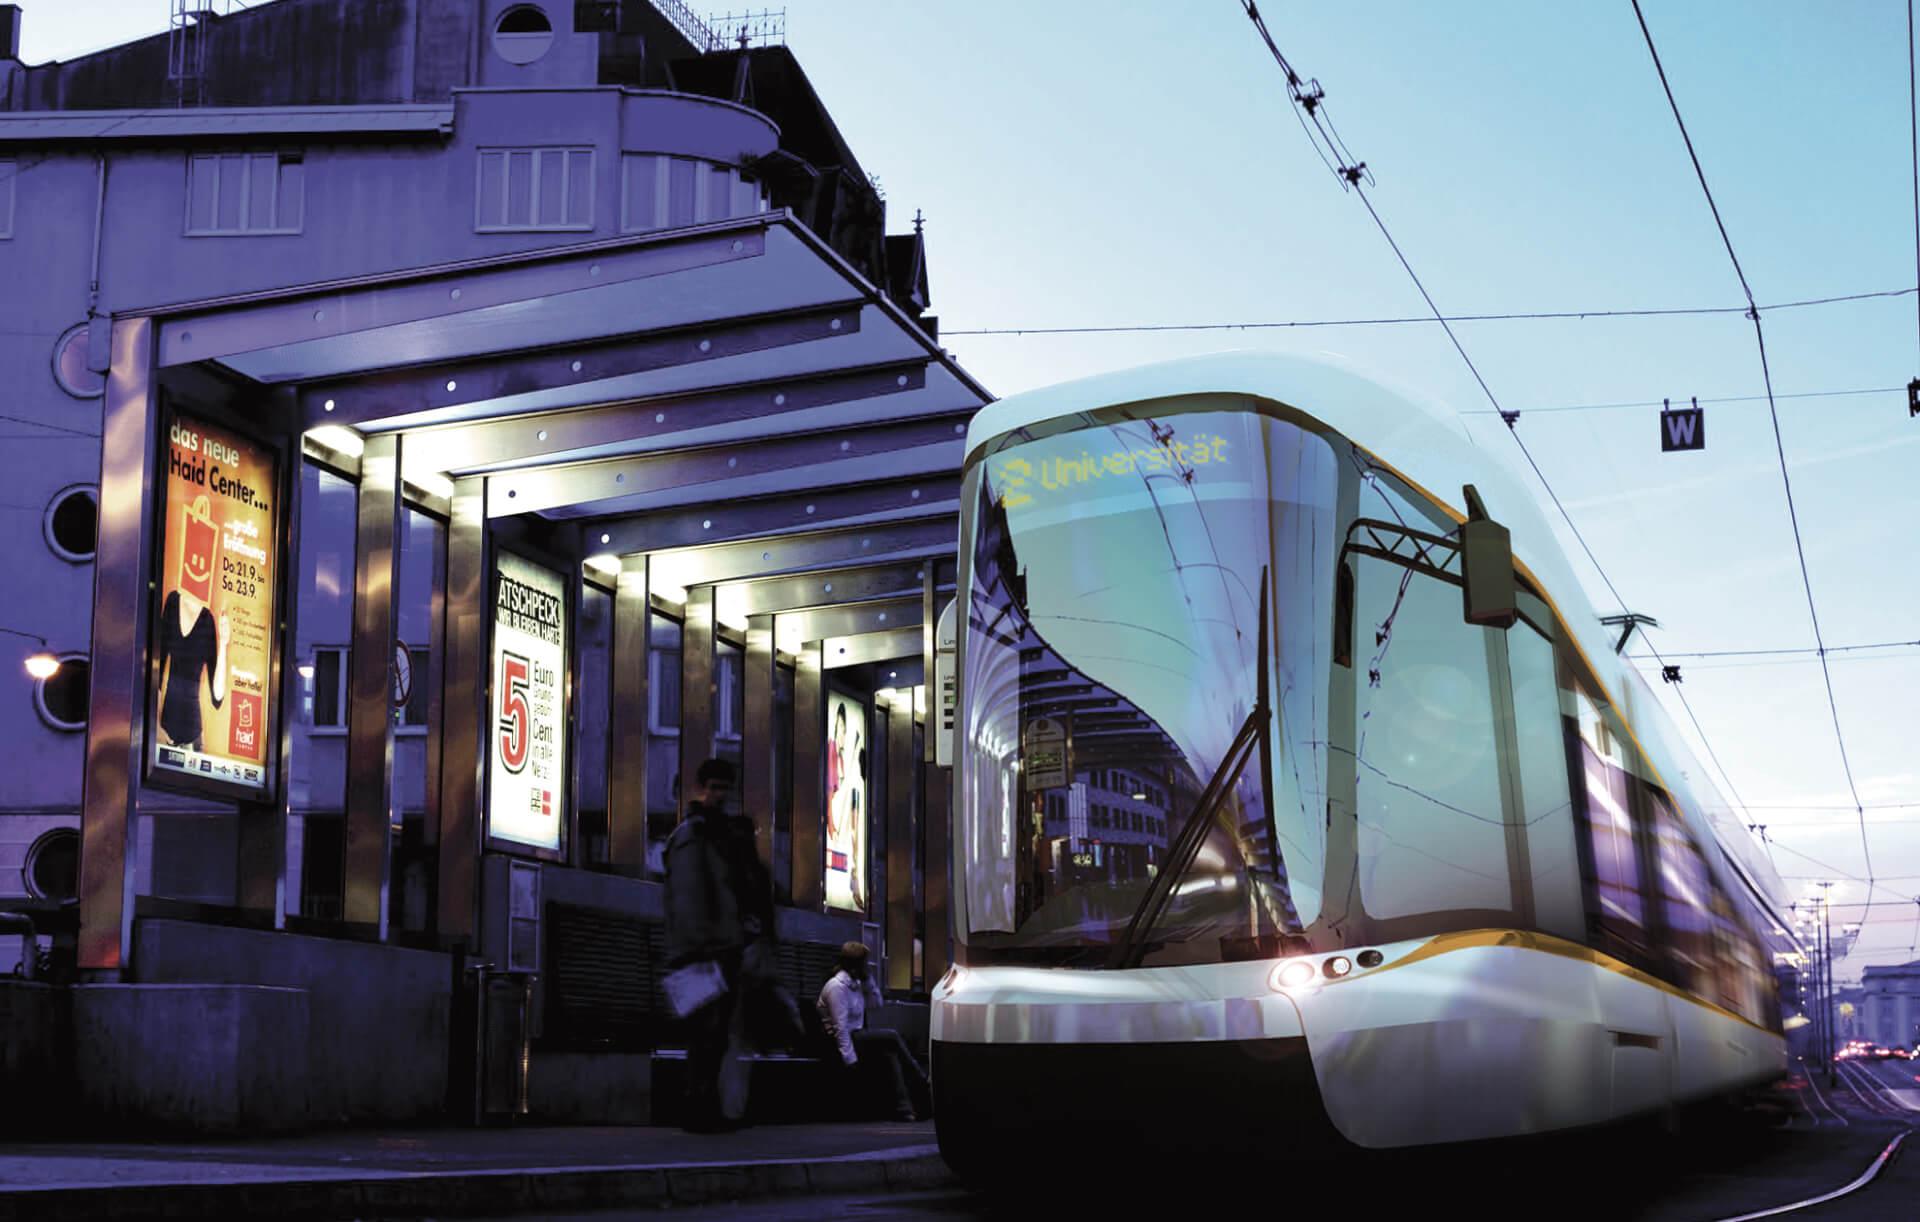 modern tram rendering in evening light